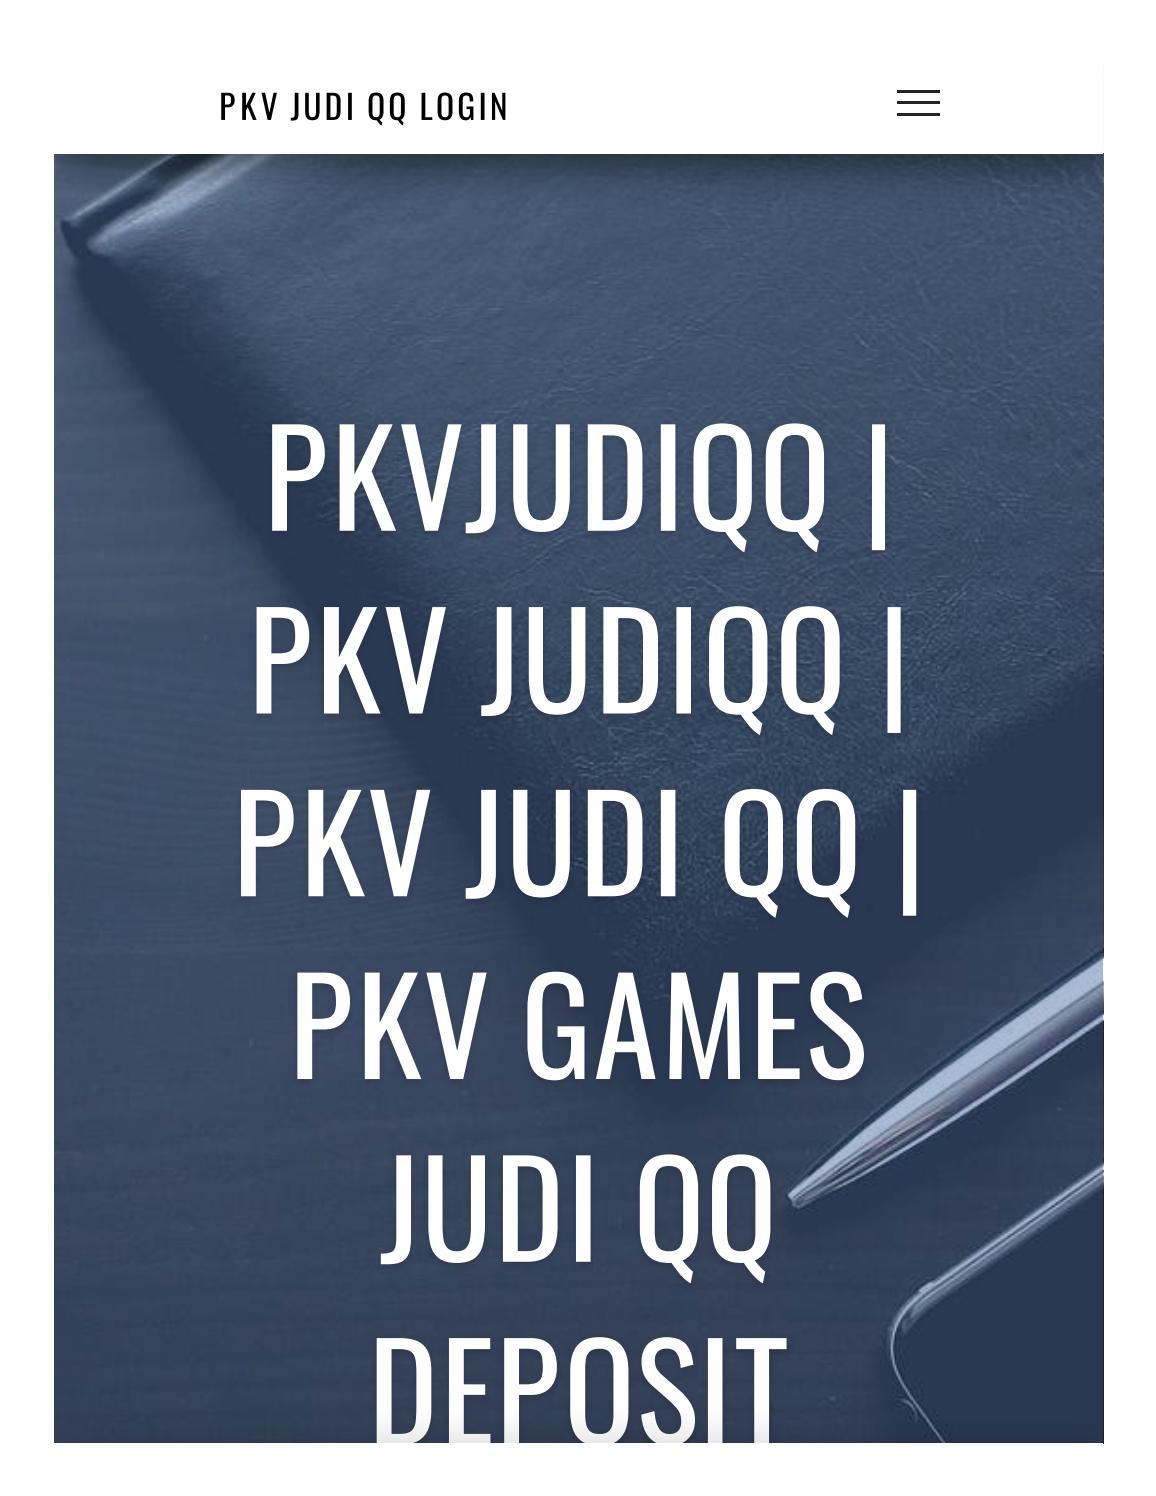 Pkvjudiqq Pkv Judiqq Pkv Judi Qq Pkv Games Judi Qq Deposit Pulsa Http 185 149 112 229 By Pkv Games Qq Winnipoker Net Issuu